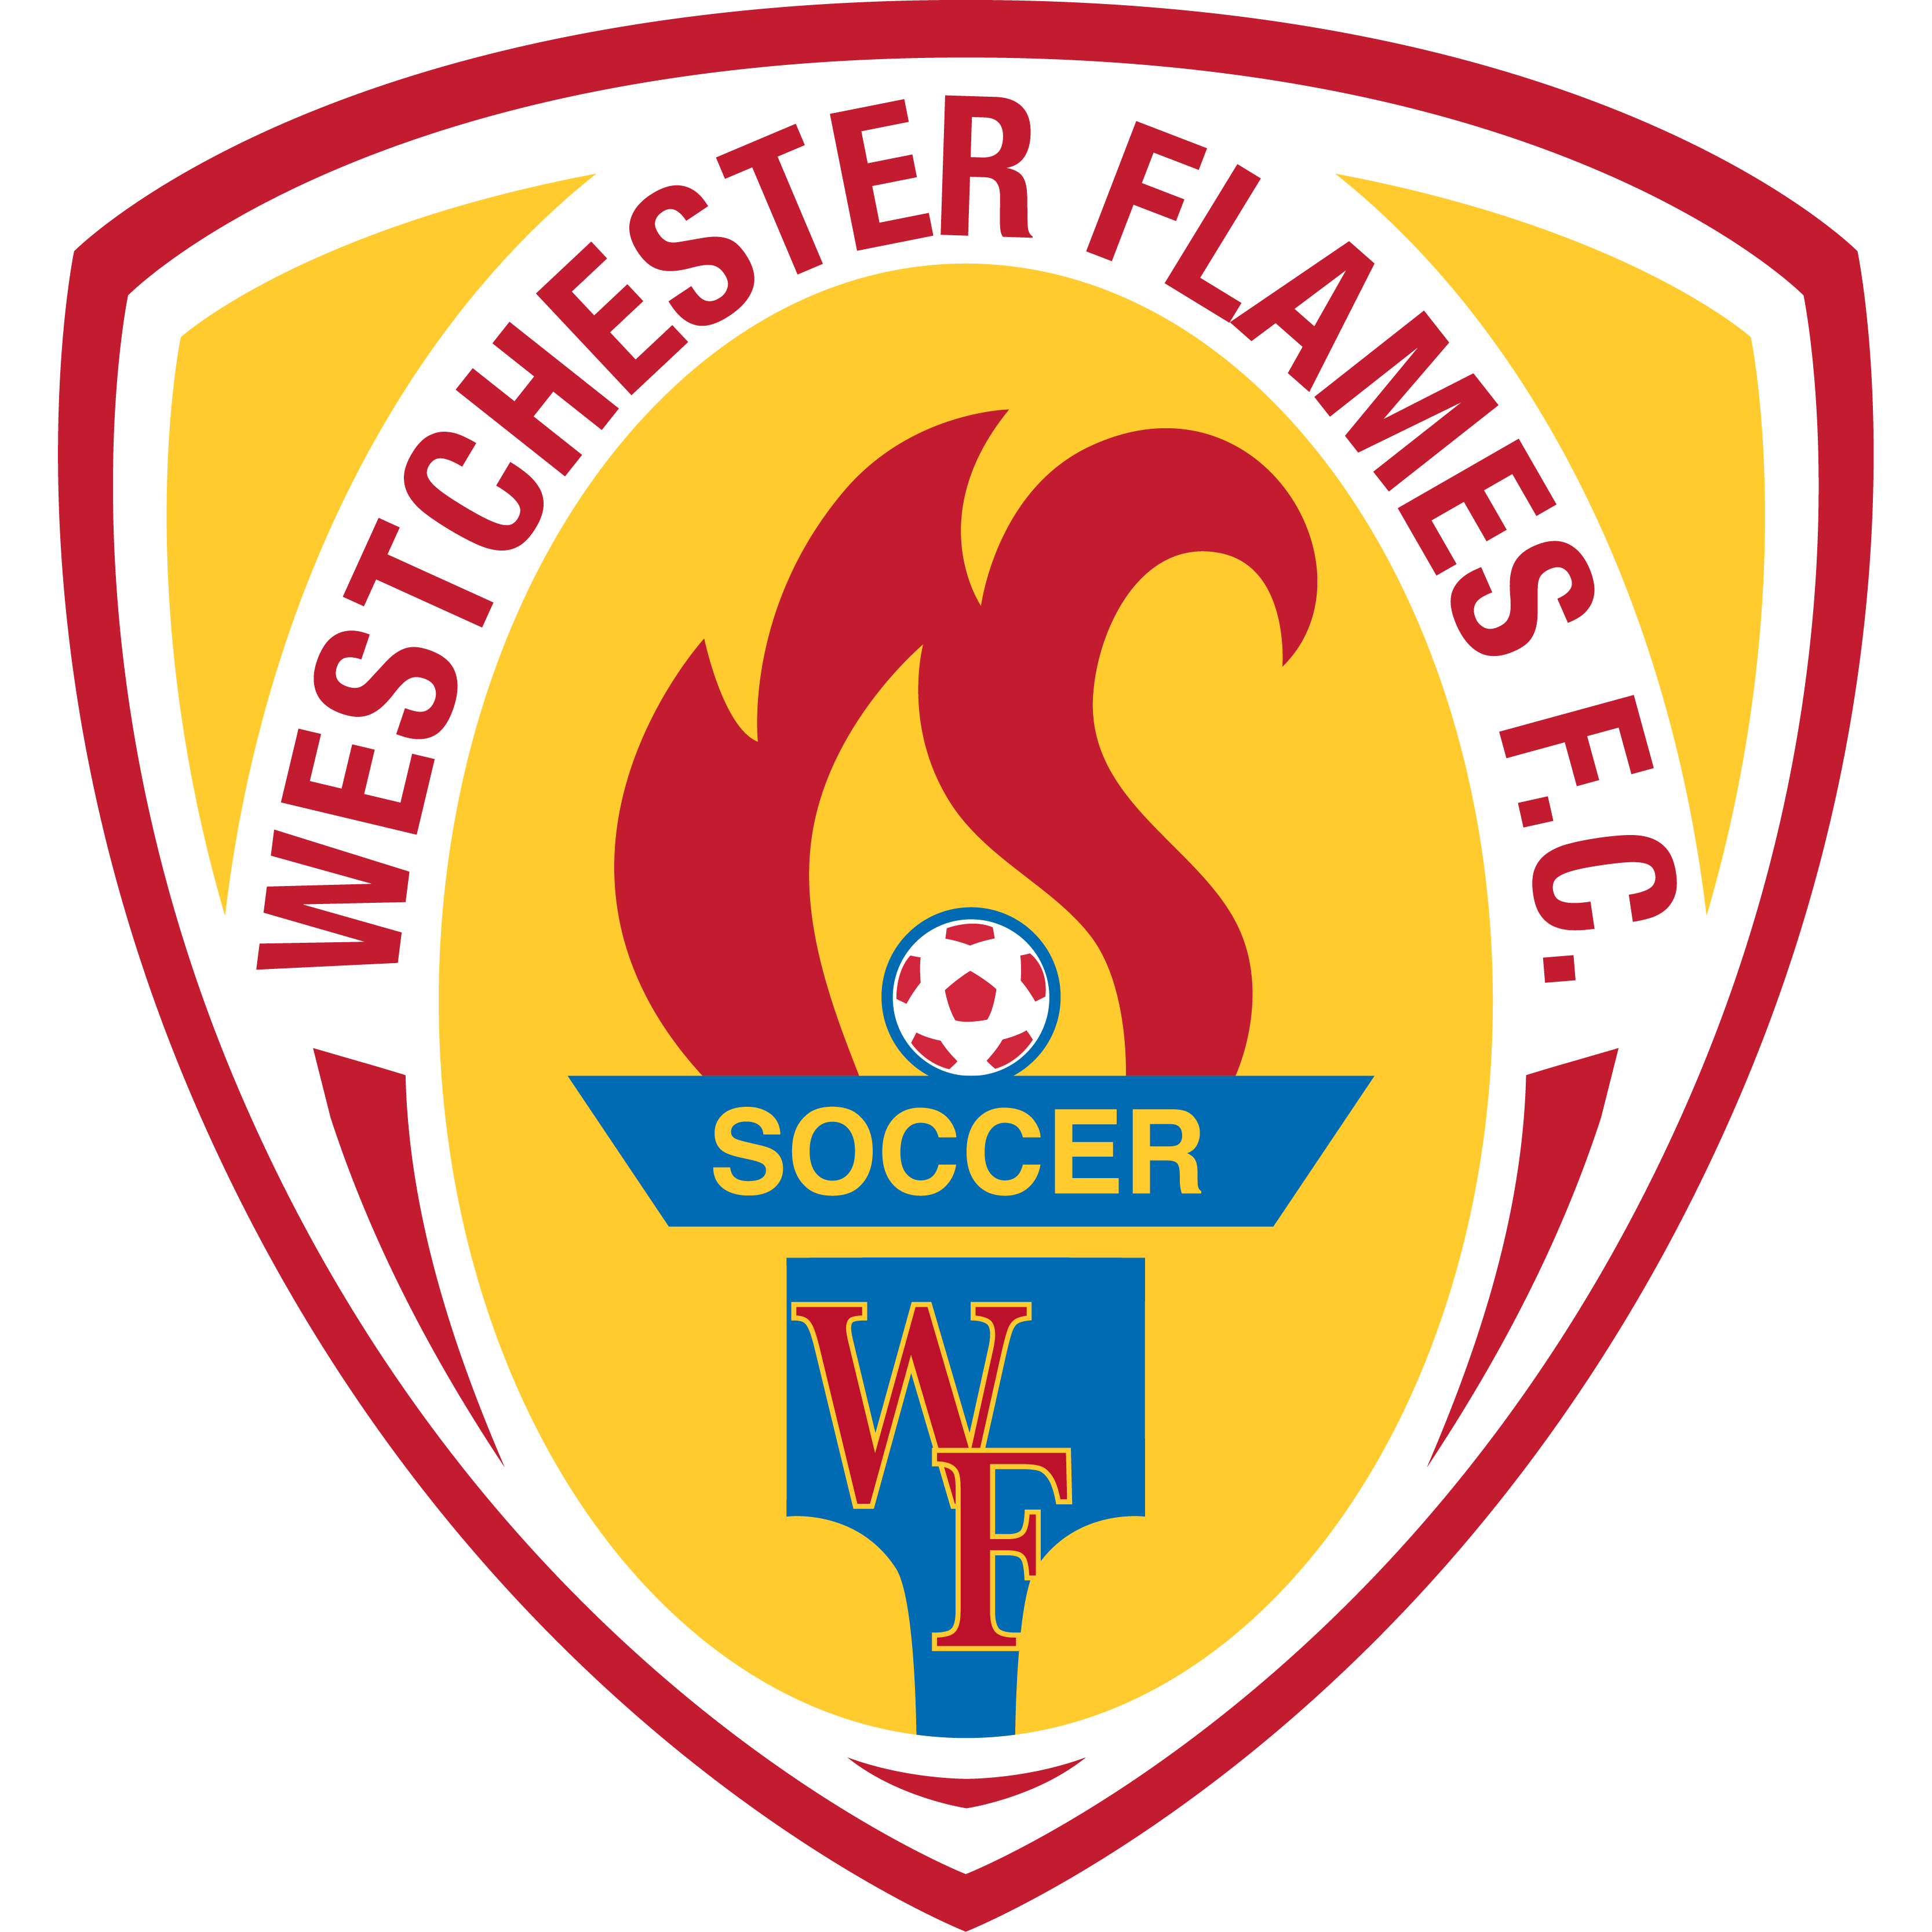 Westchester Flames